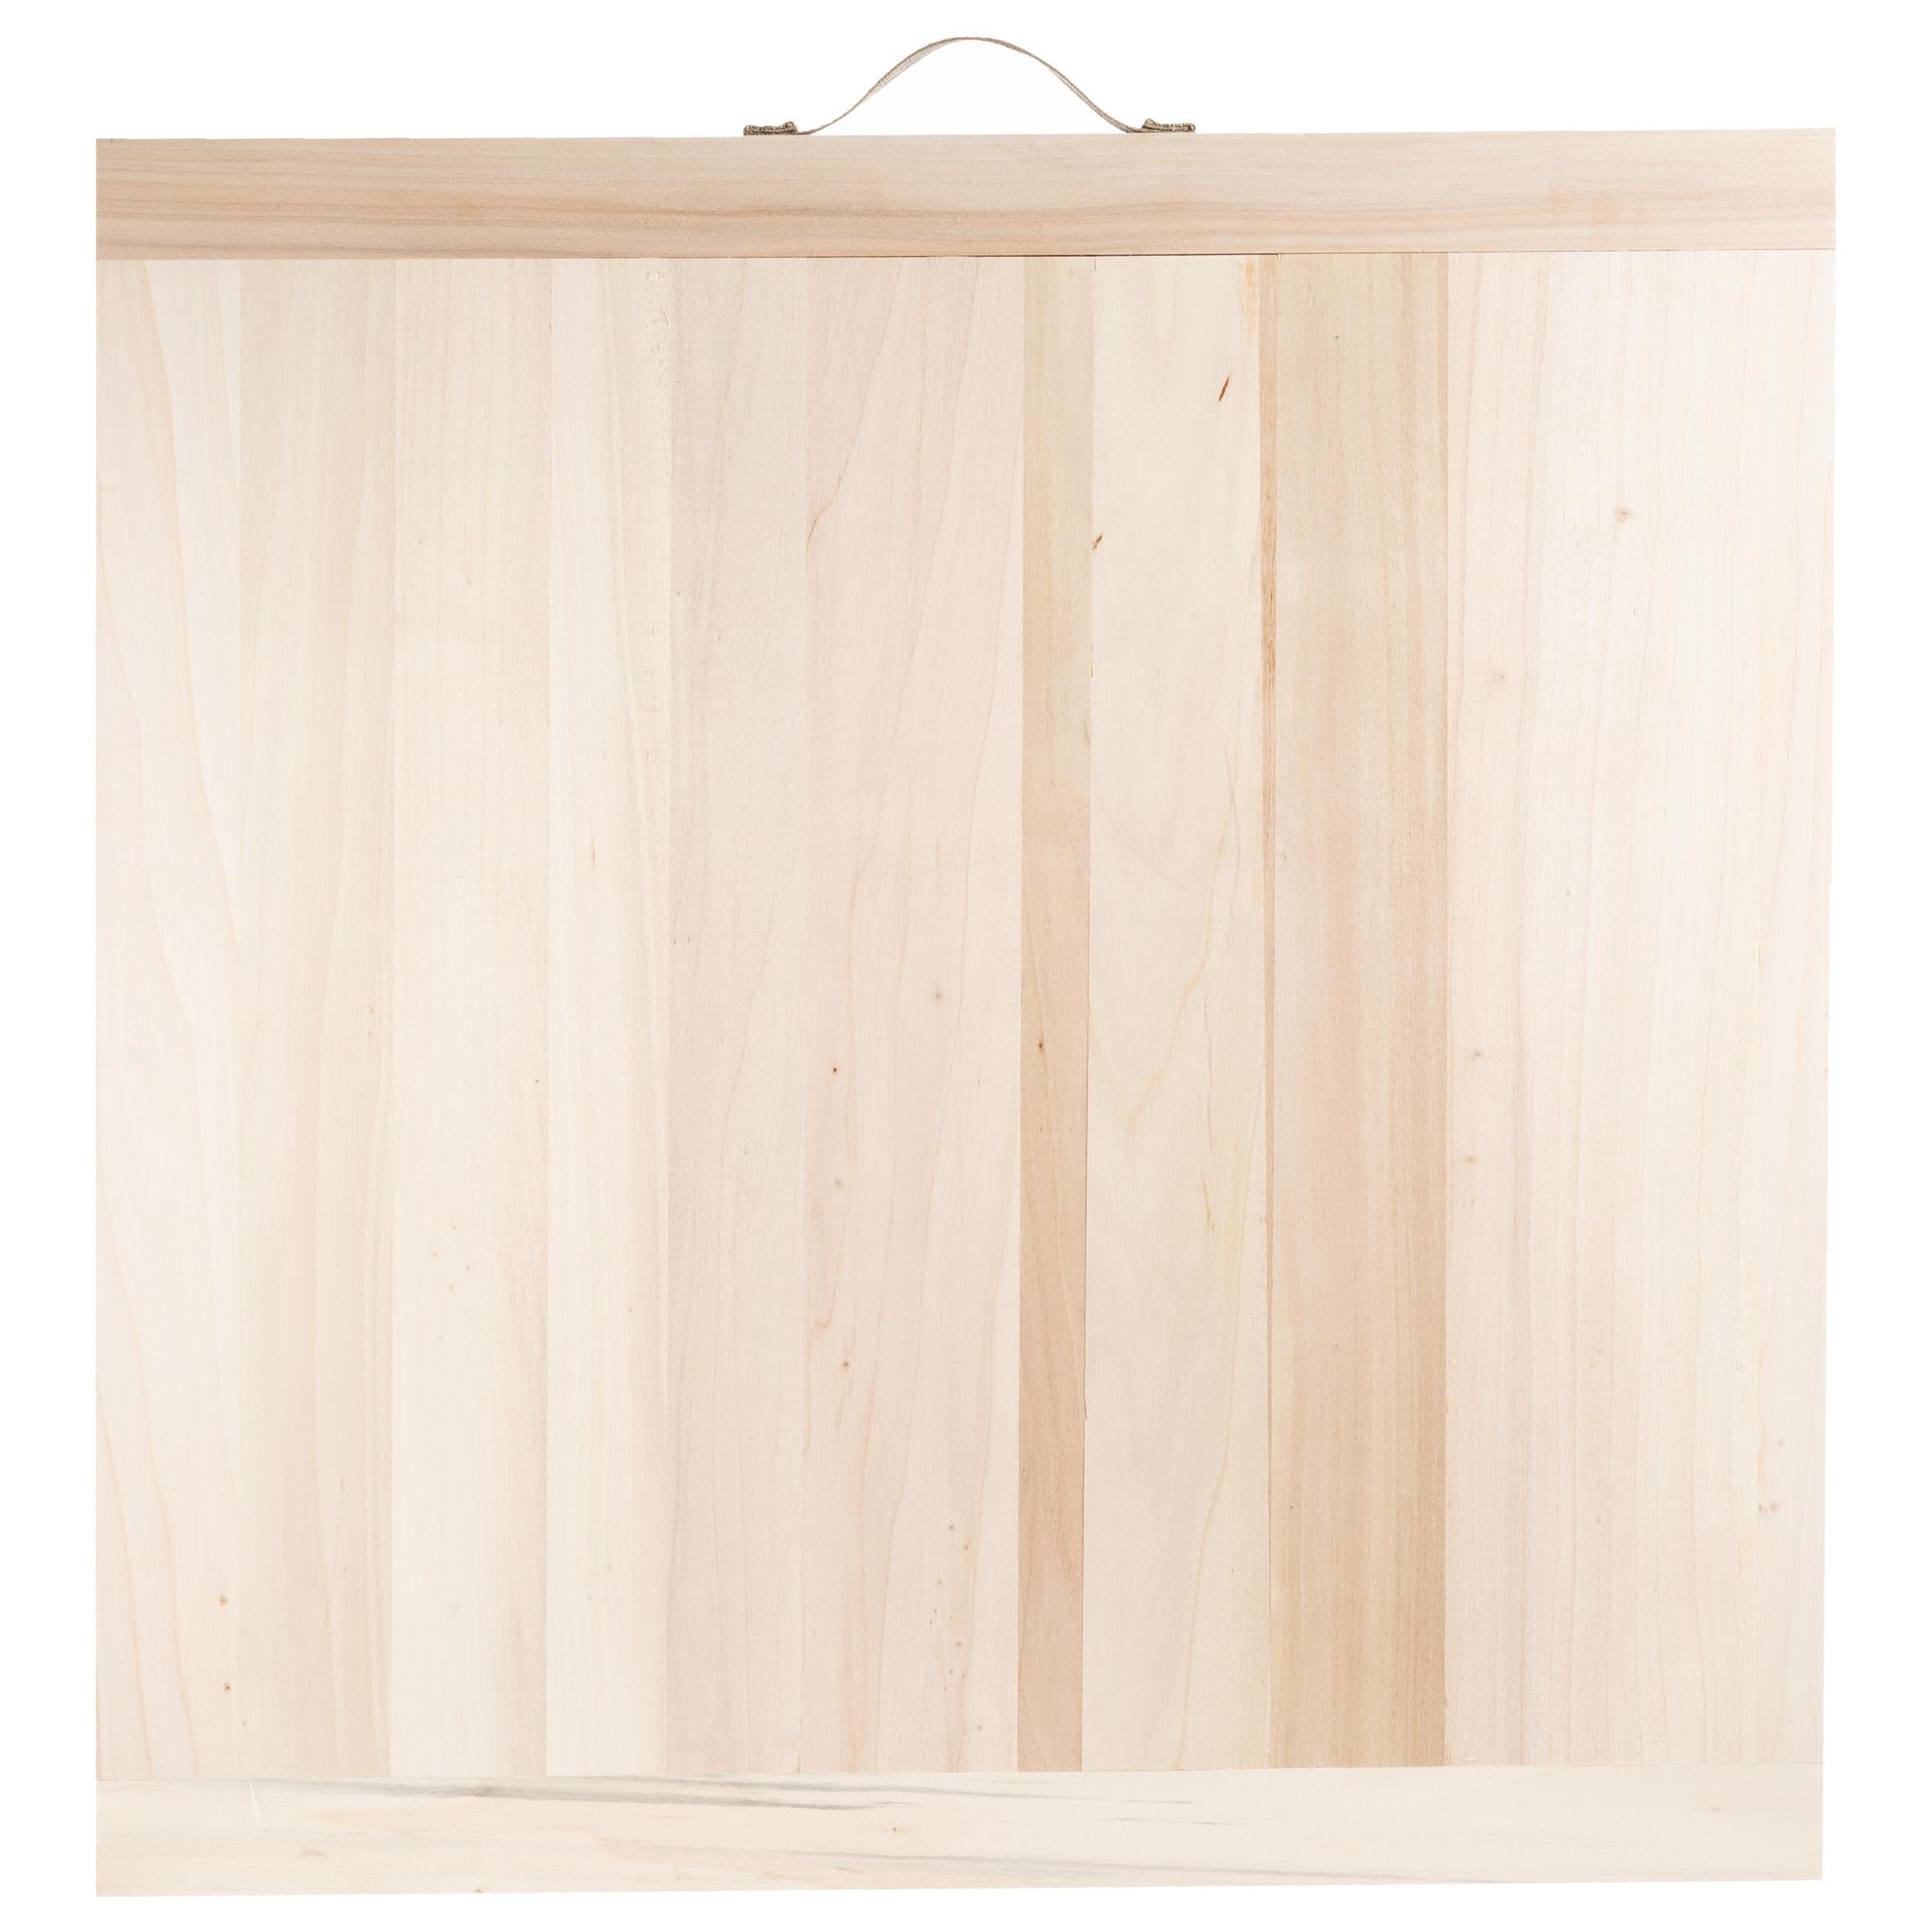 Planșă din lemn Joc de Palets